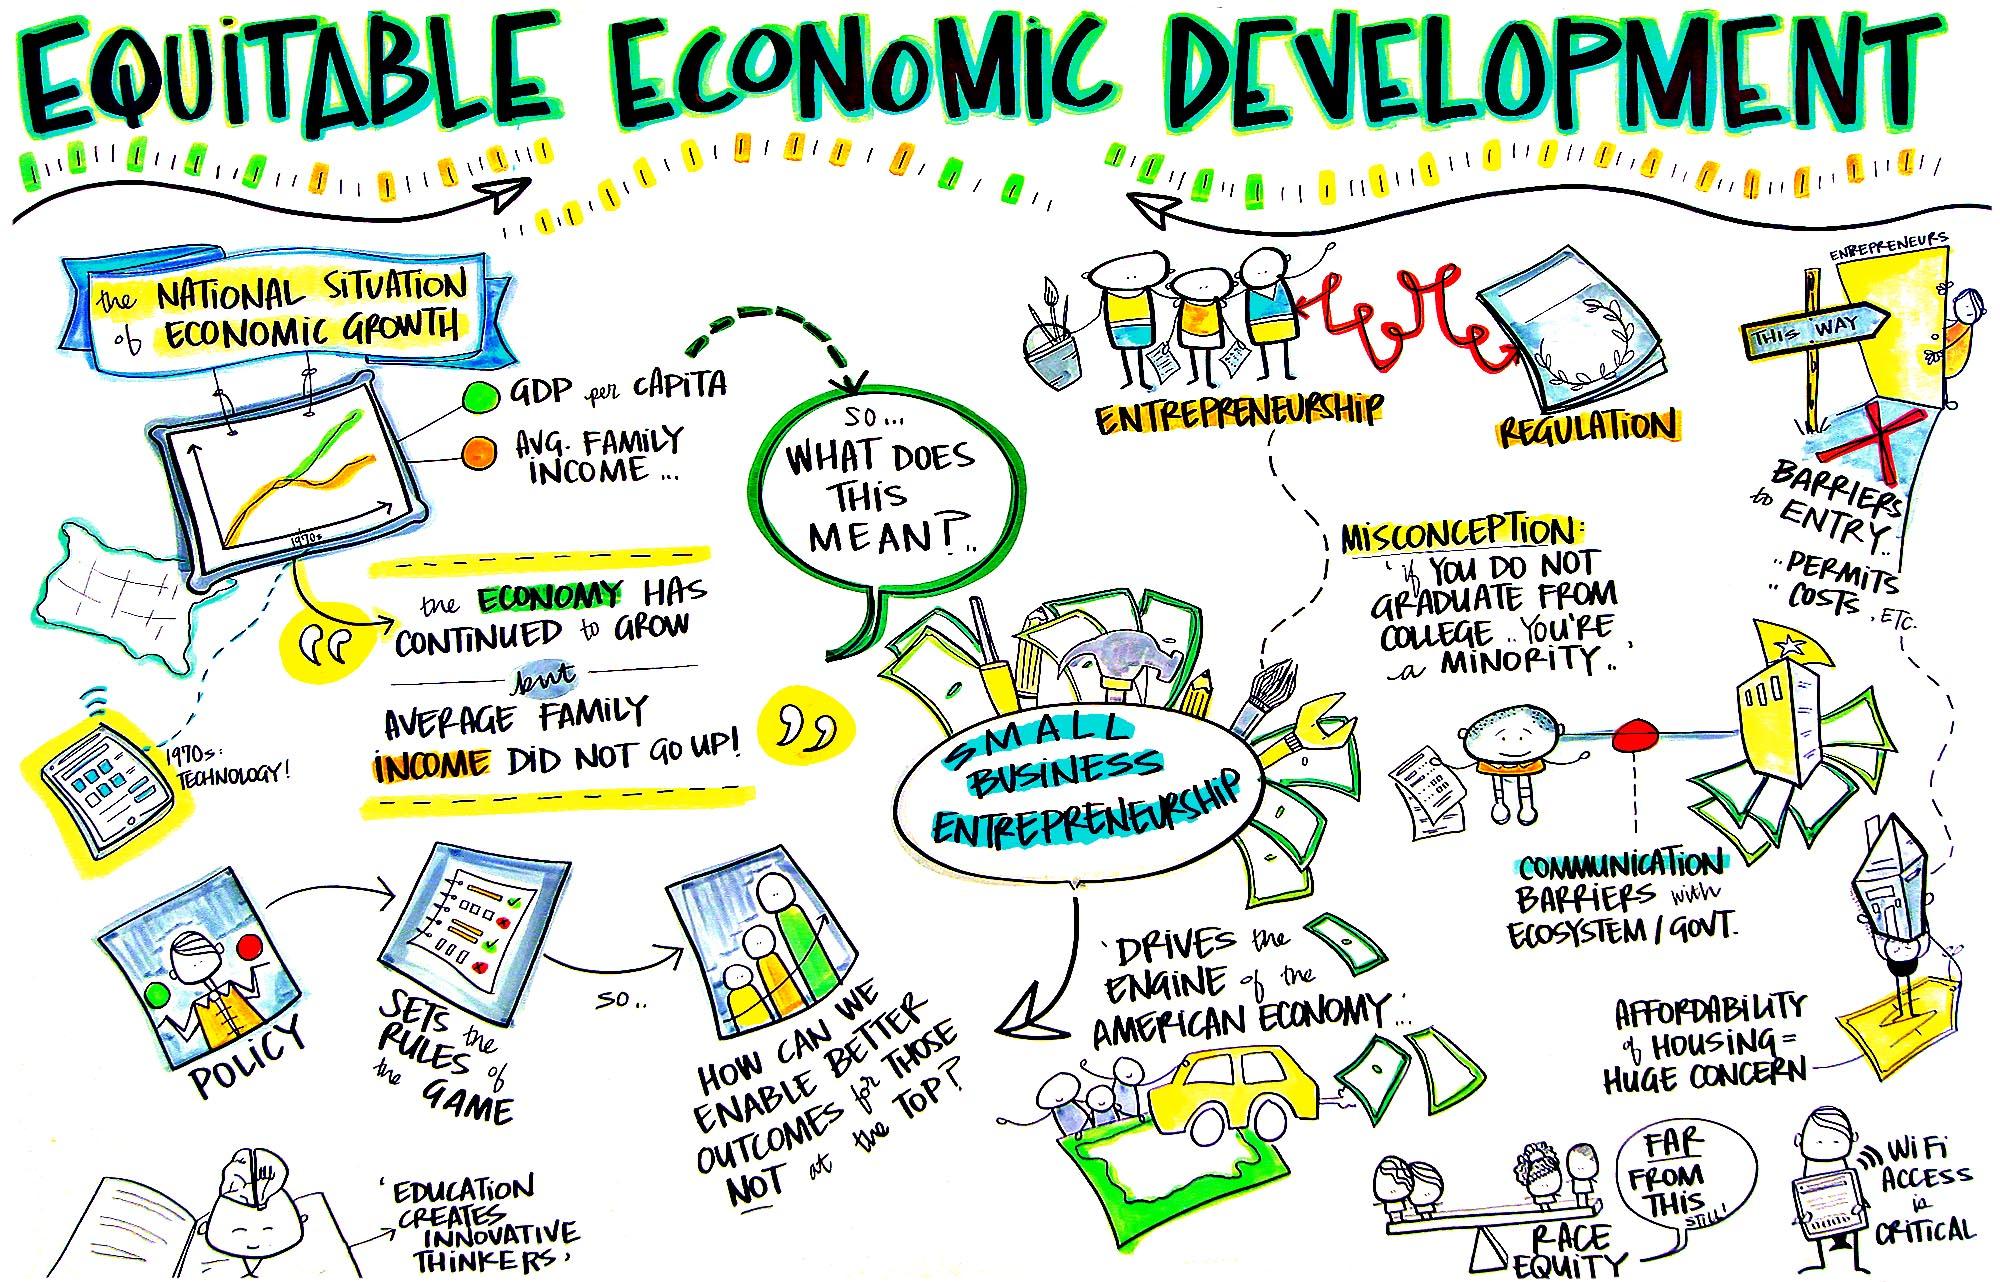 Equitable Economic Development Scribing 1 | Mayors Conference 2017